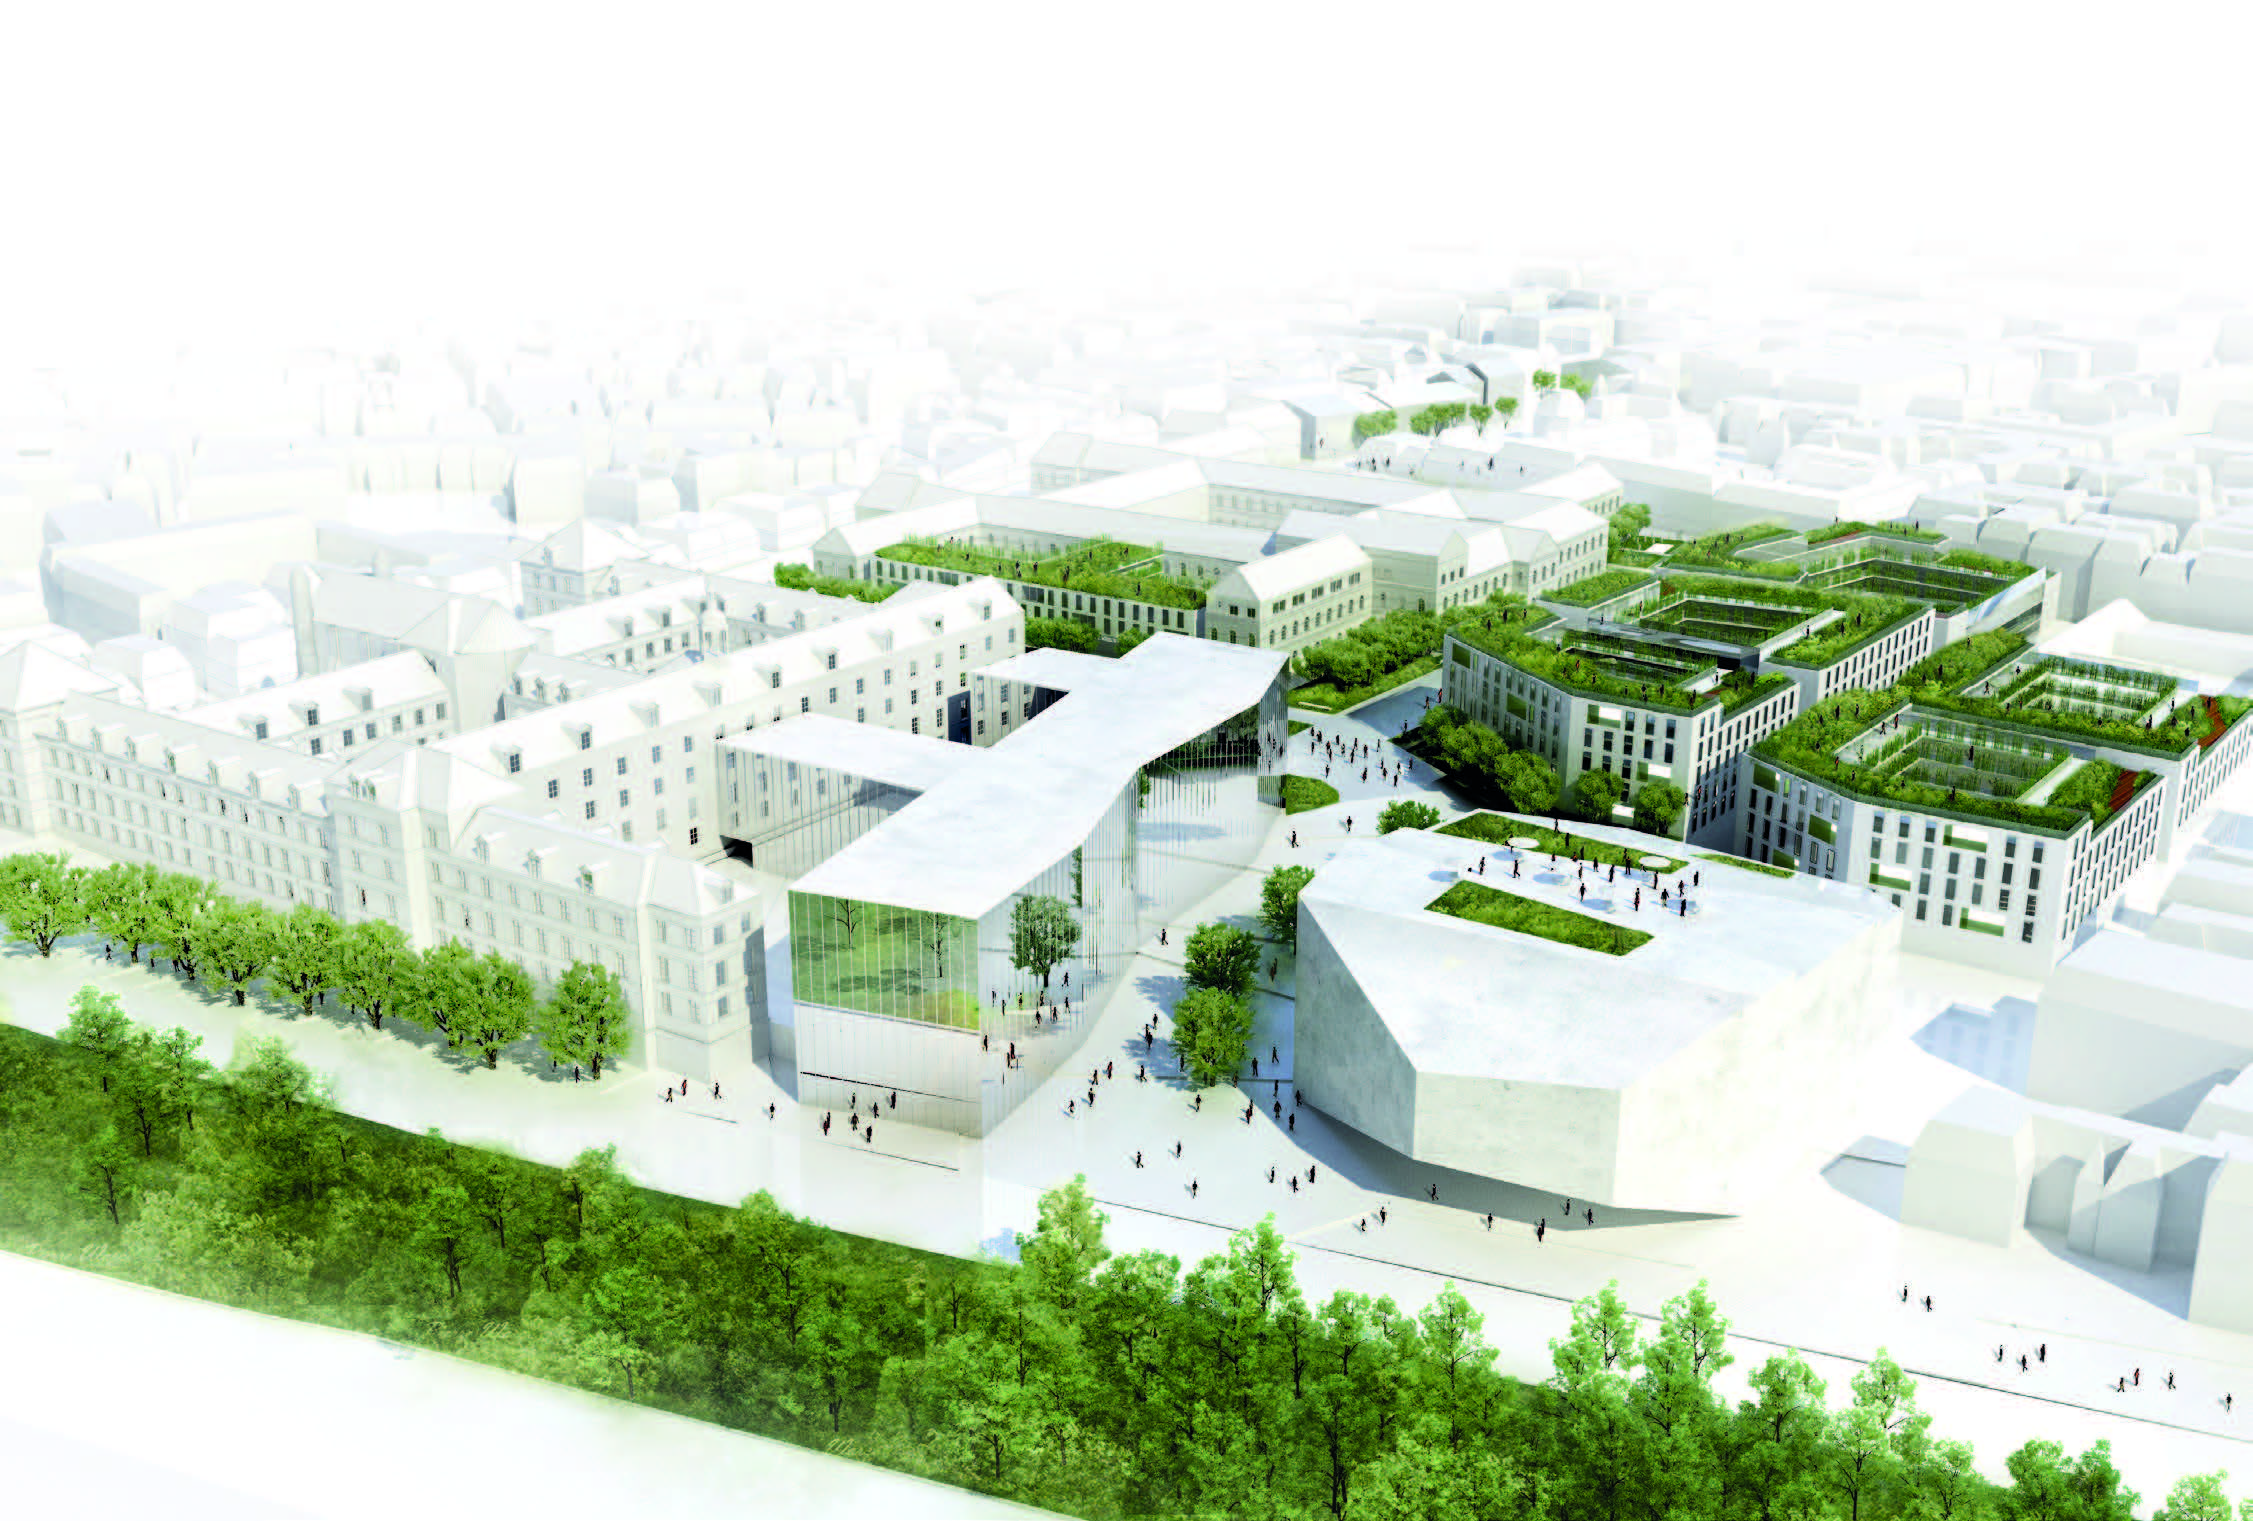 ZAC des Carmes, Orléans (45), Ferrier Marchetti Studio, 80 000m²